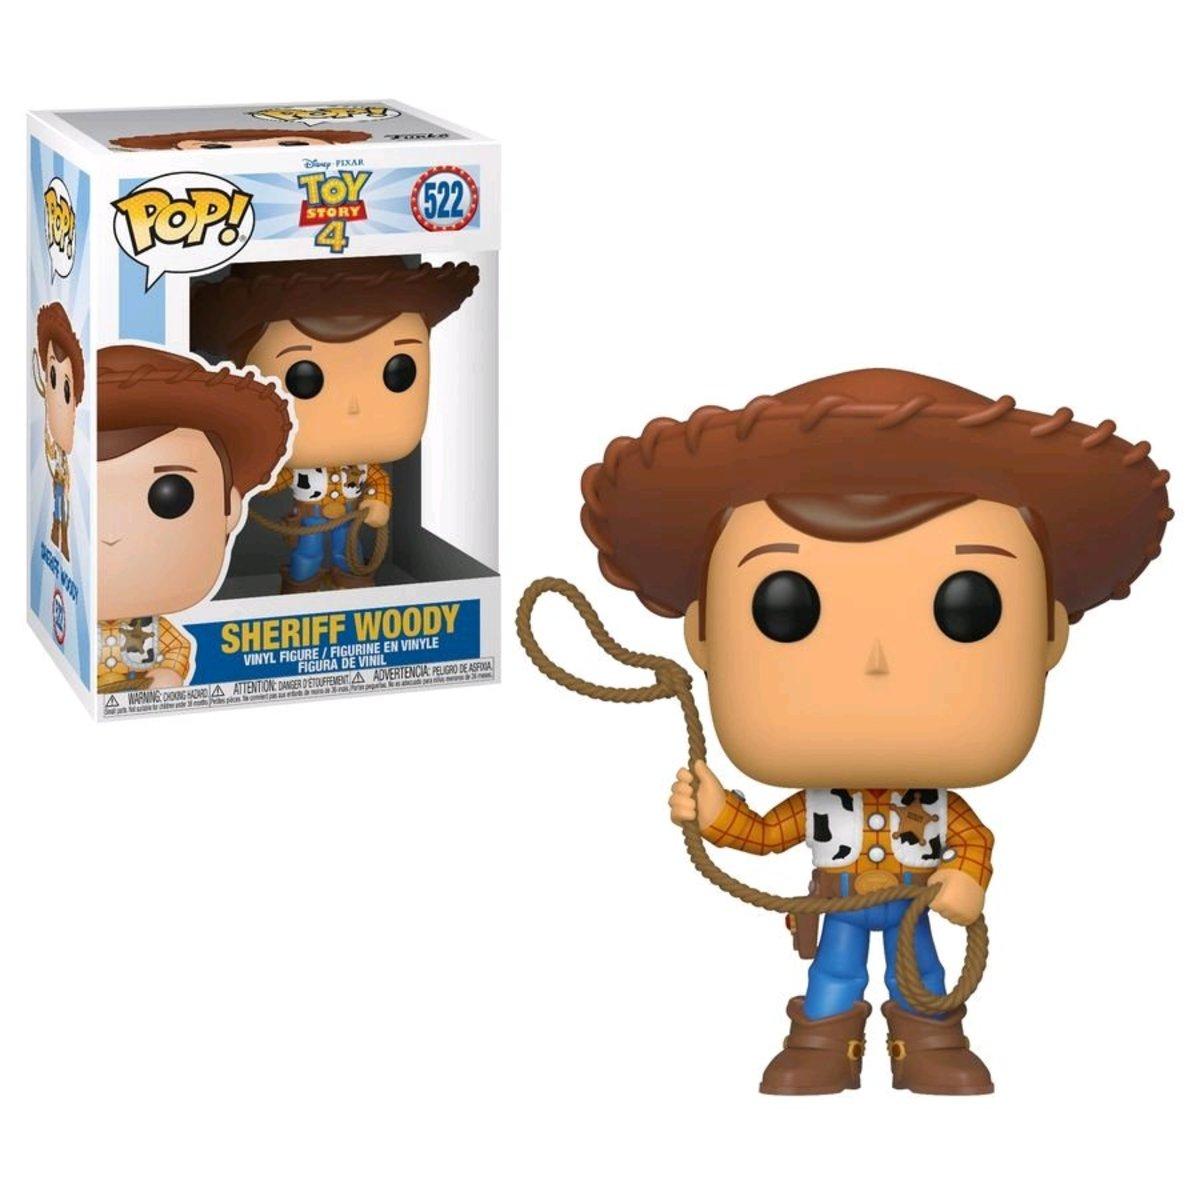 POP Disney: Toy Story 4 - Woody [Licensed by Disney]